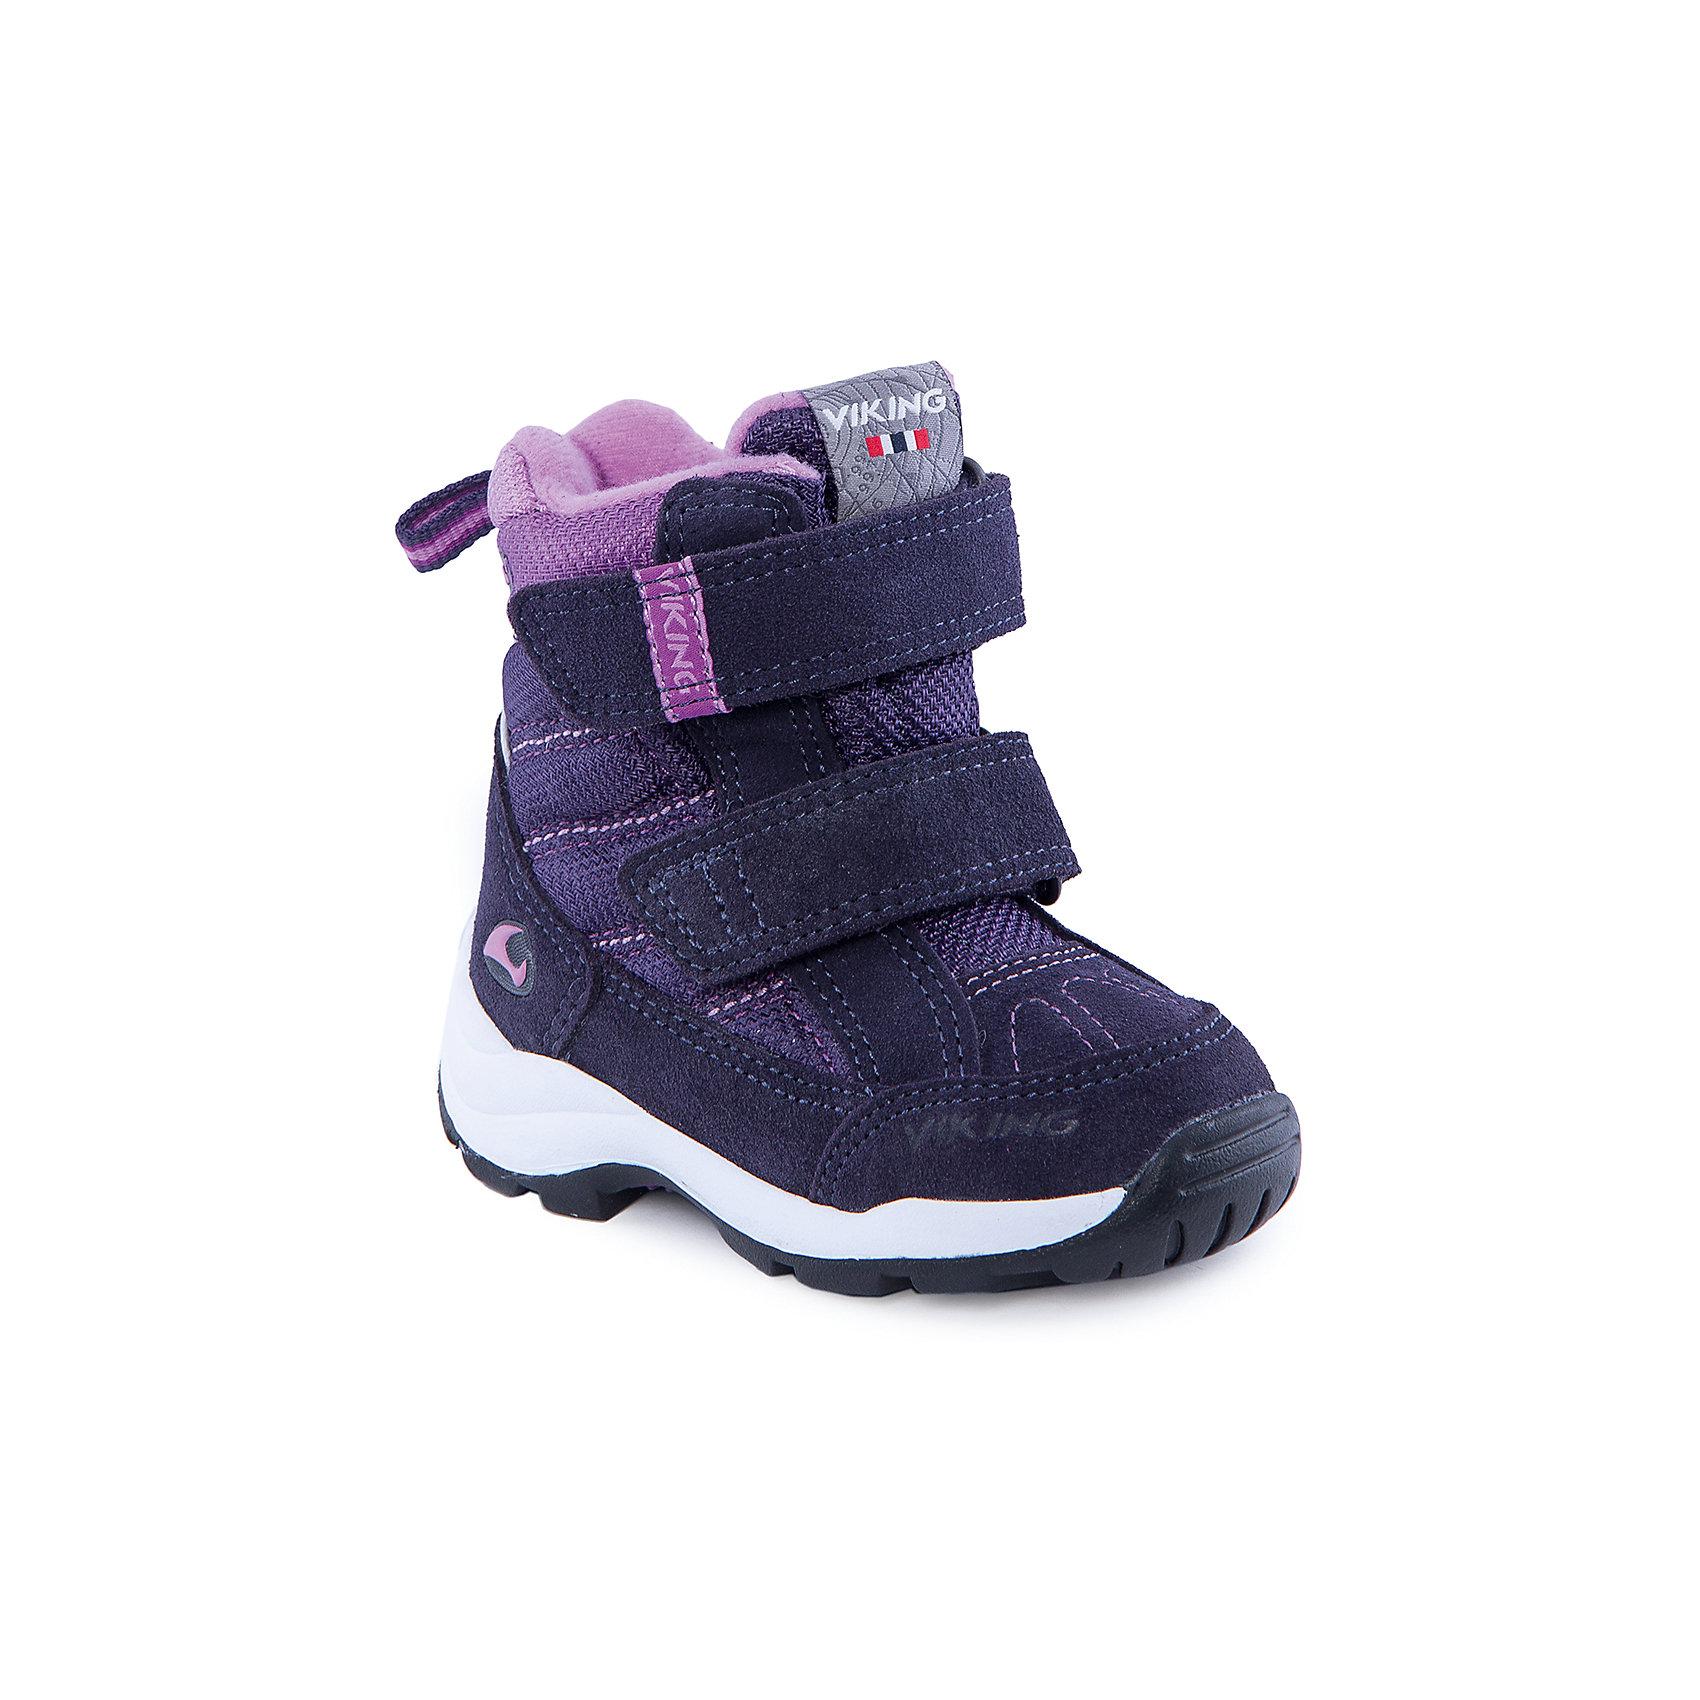 VIKING Ботинки для девочки VIKING люстра cl142121 citilux